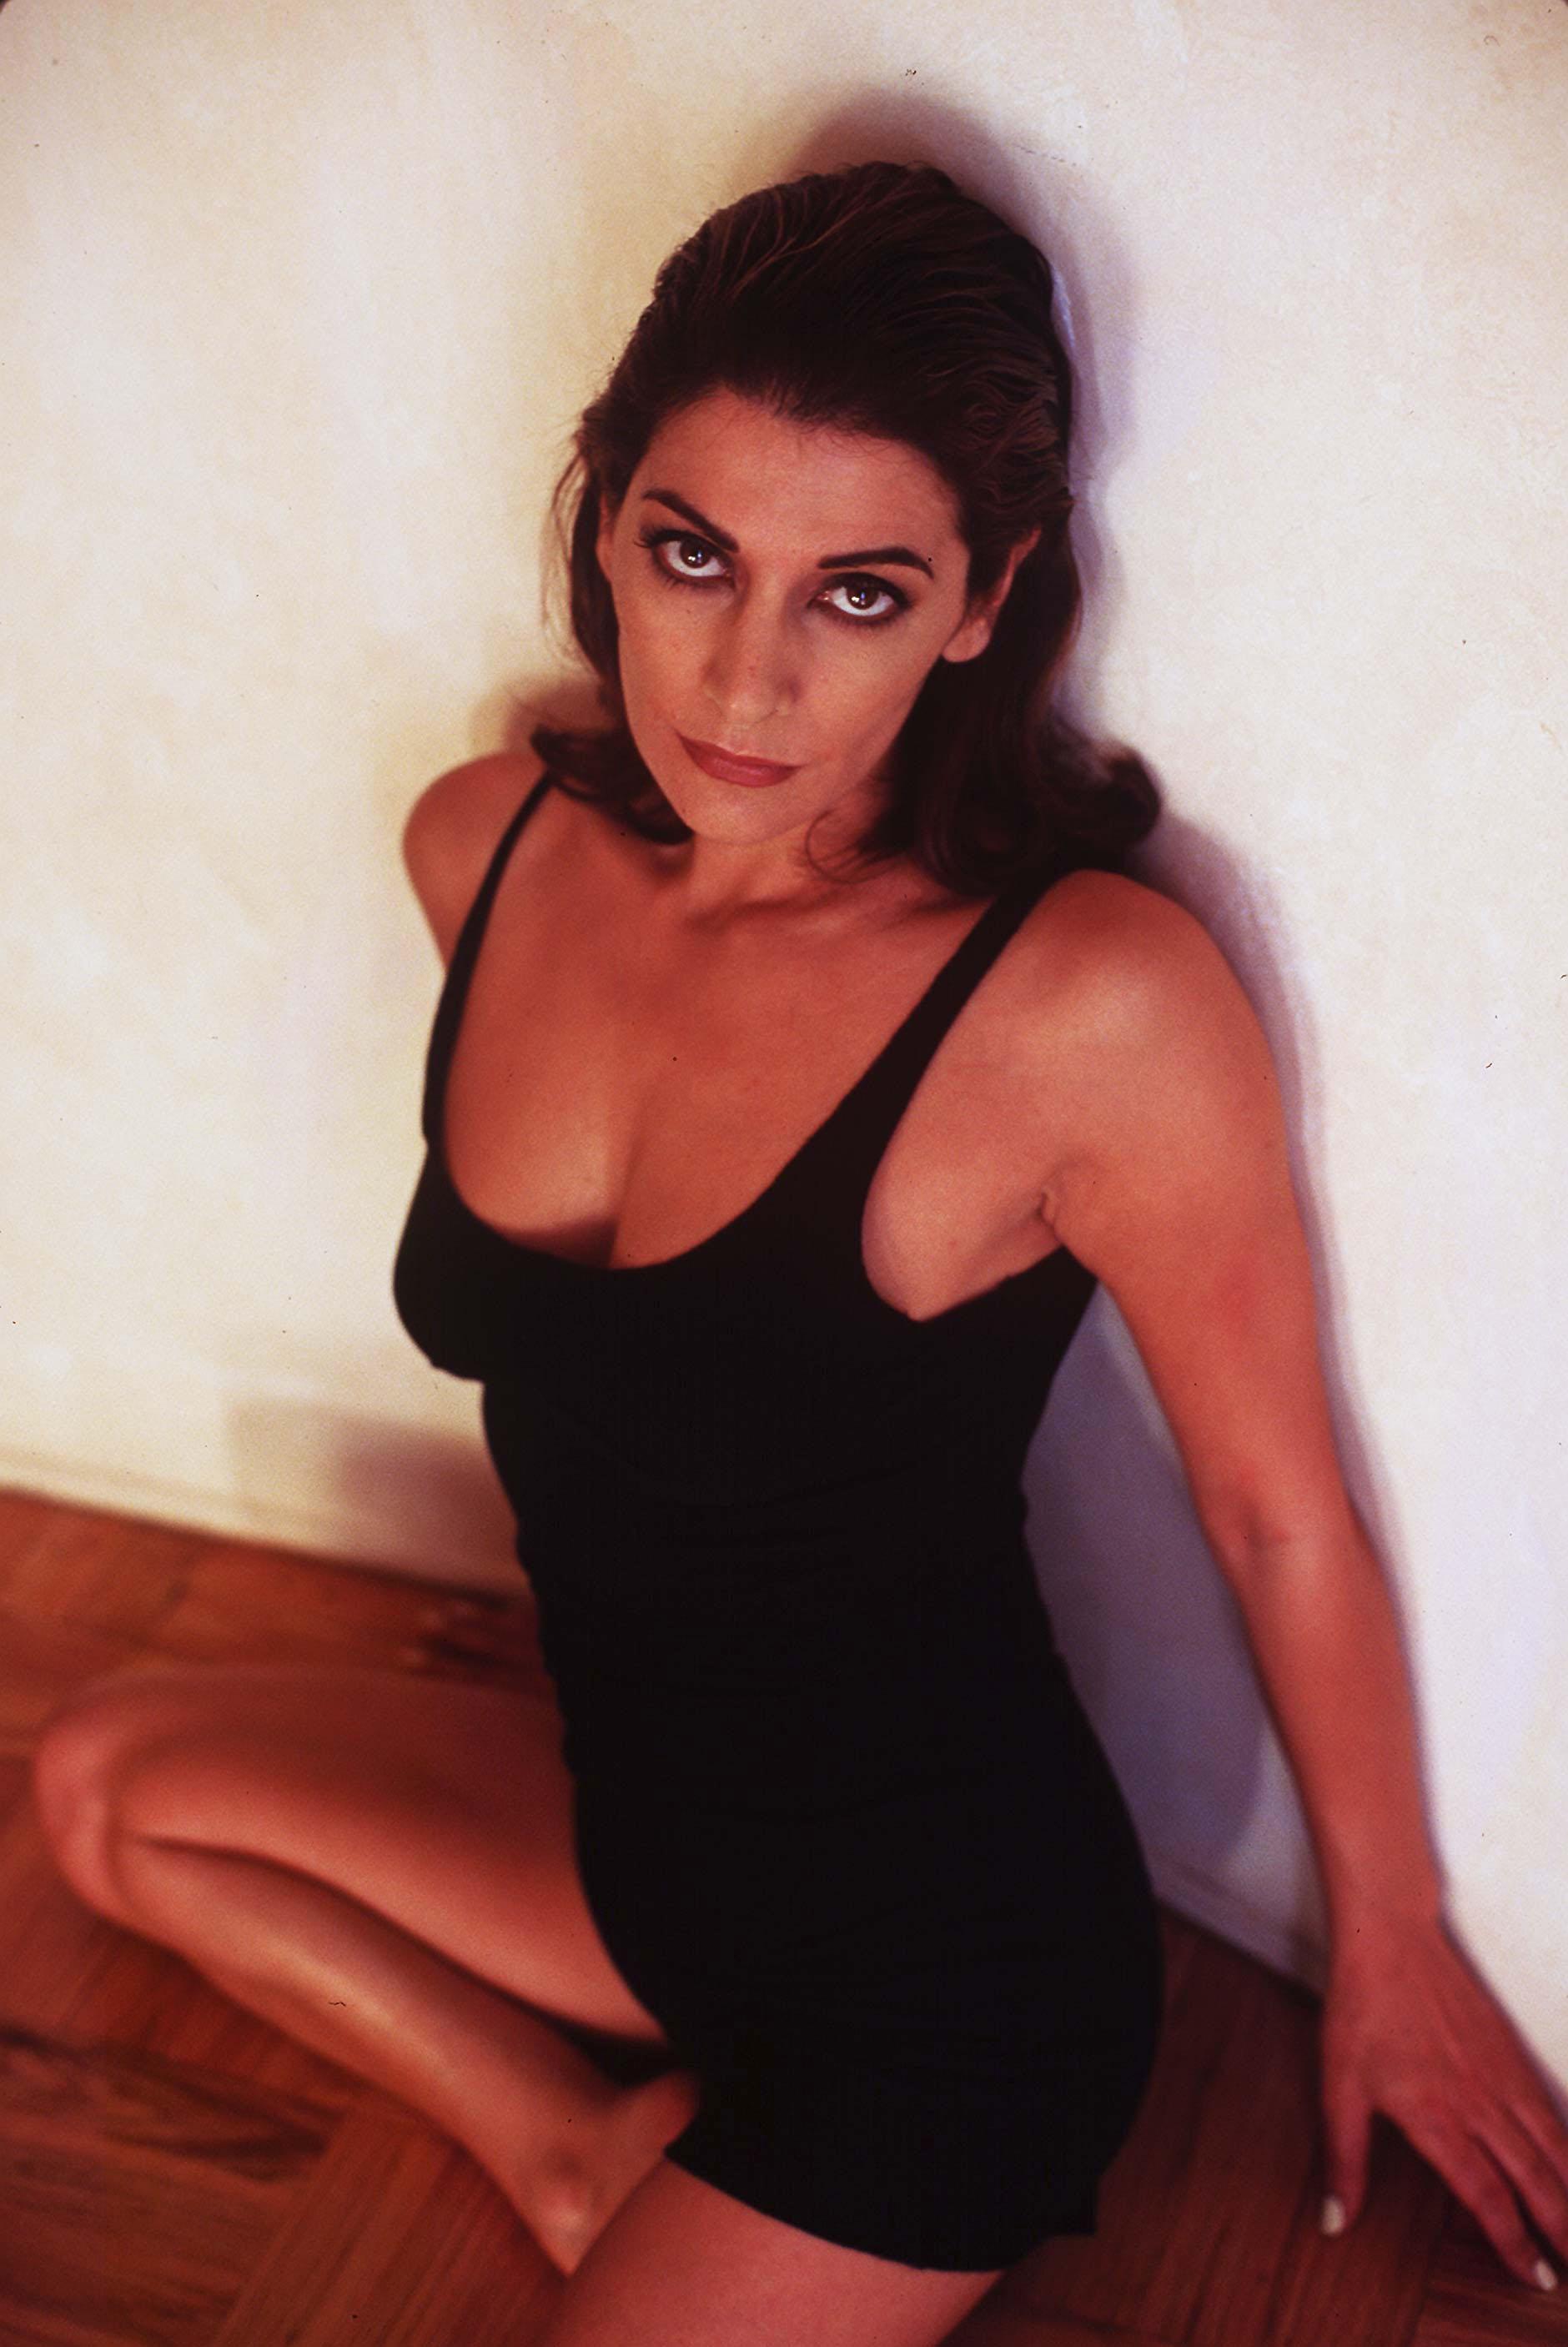 Marina Sirtis nude (24 photos), Tits, Hot, Selfie, lingerie 2006